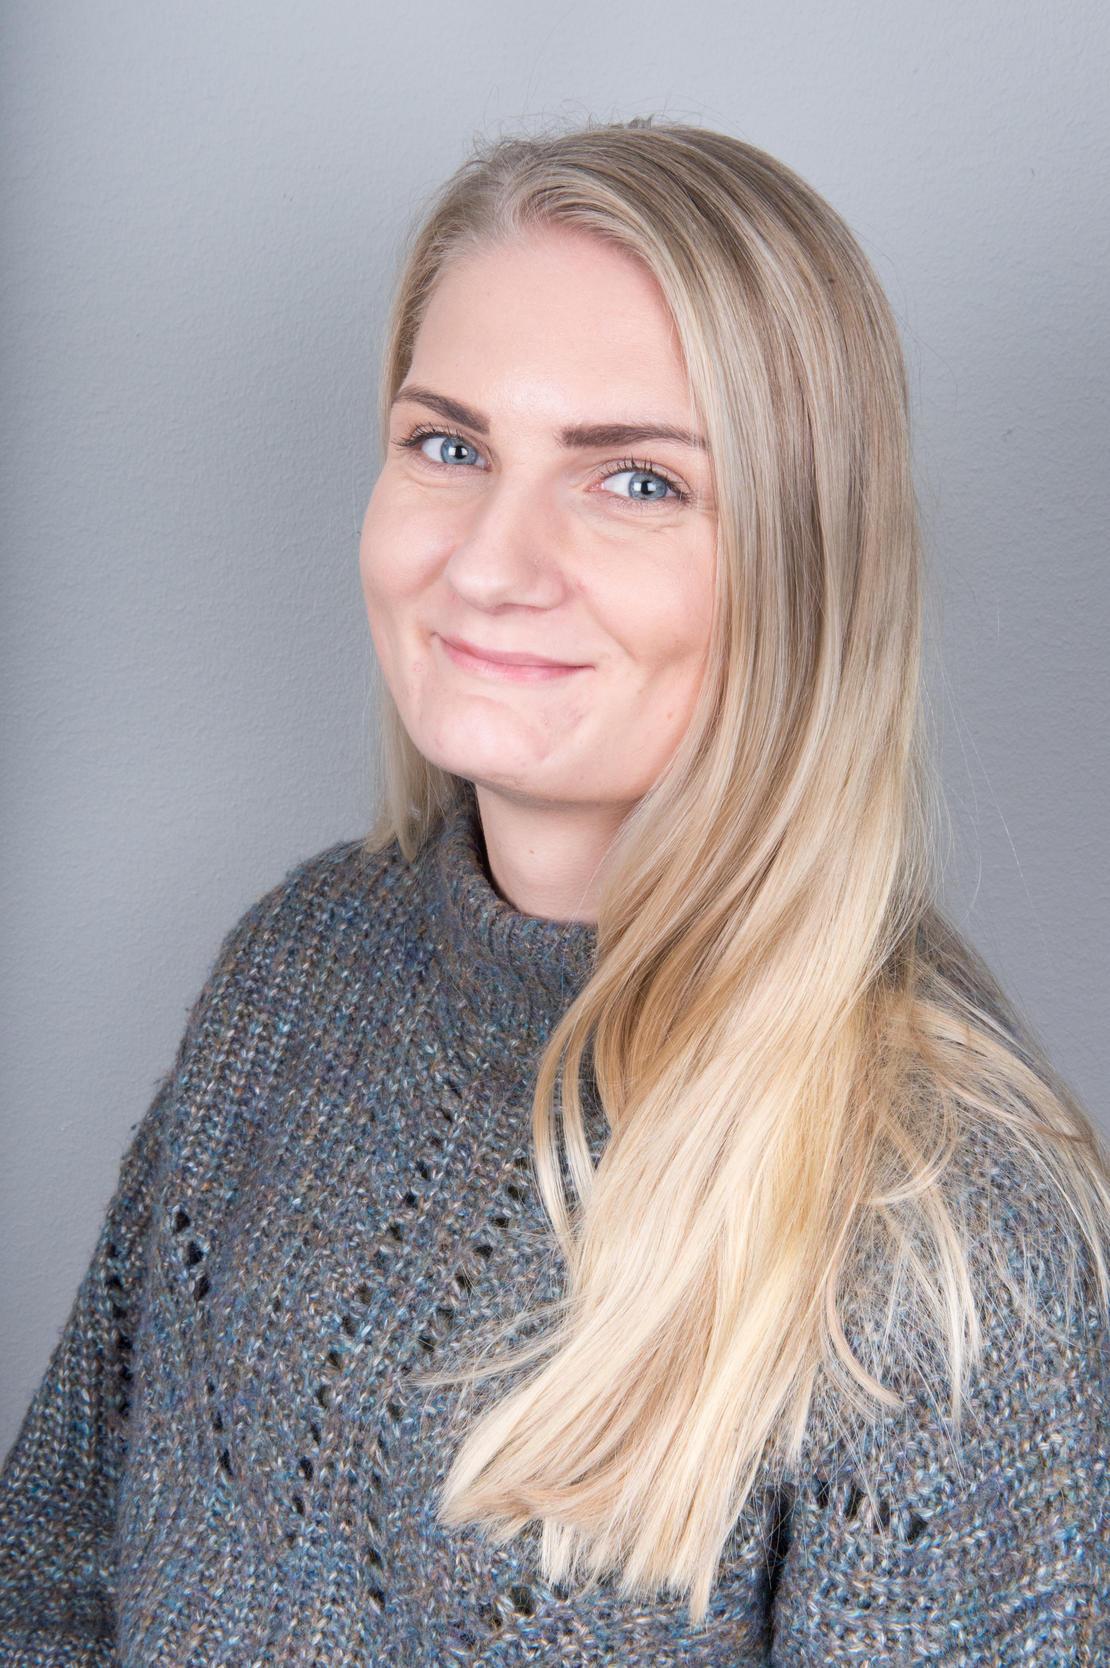 NY NESTLEDER: Iris Jansdottir Nordberg er ny nestleder i FO-Studentenes sentralstyre